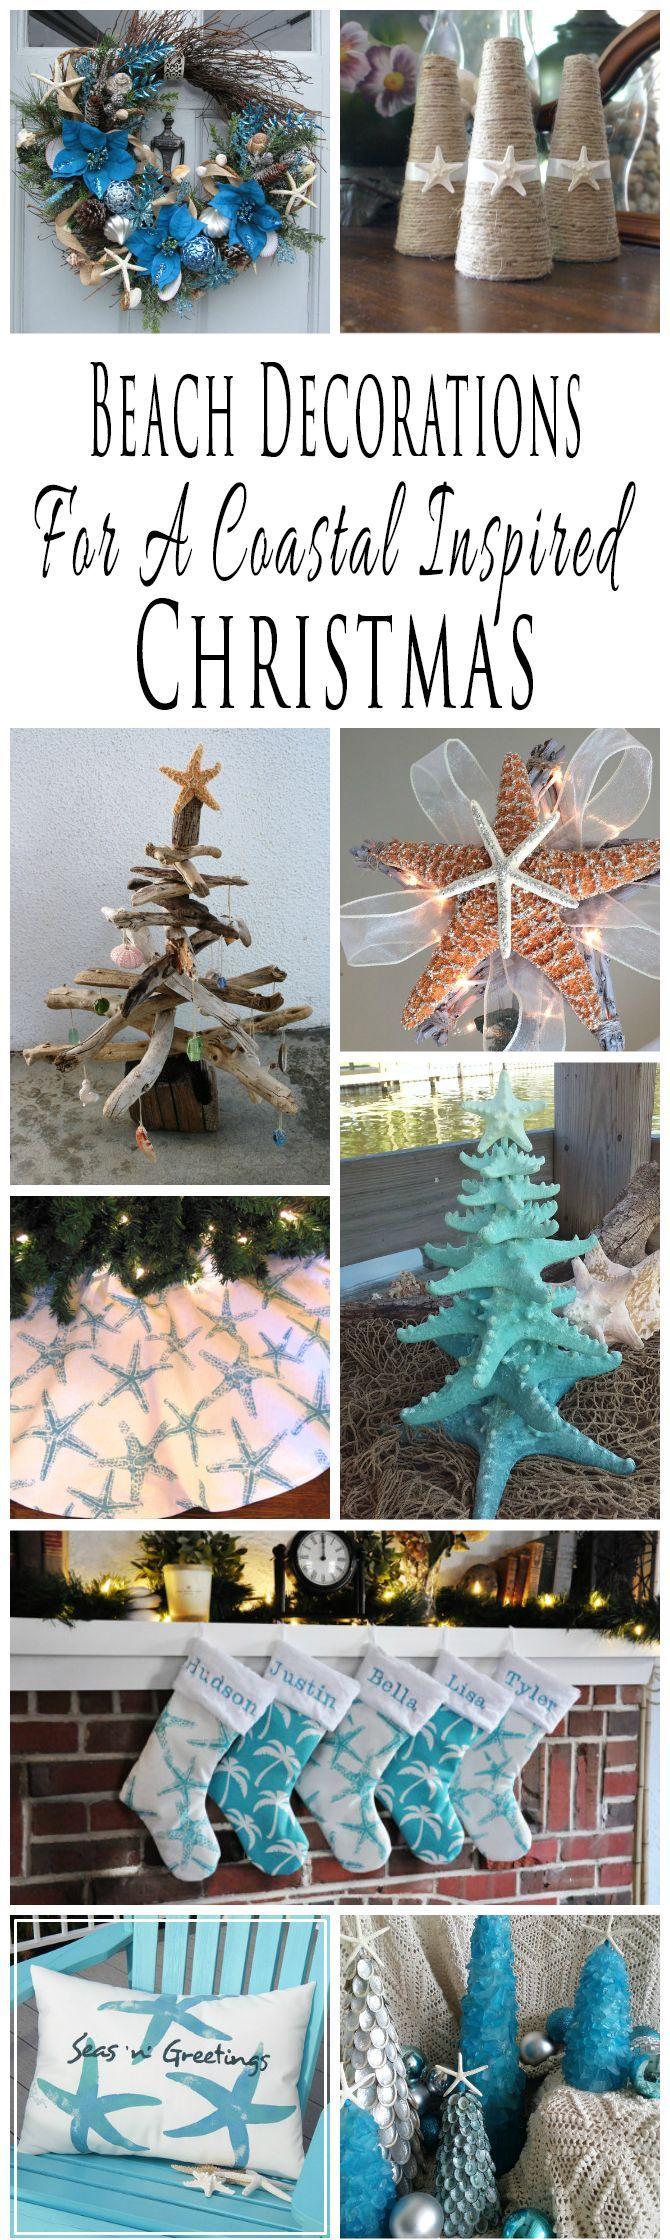 Handmade beach themed Christmas decorations and decor for a coastal inspired Christmas.